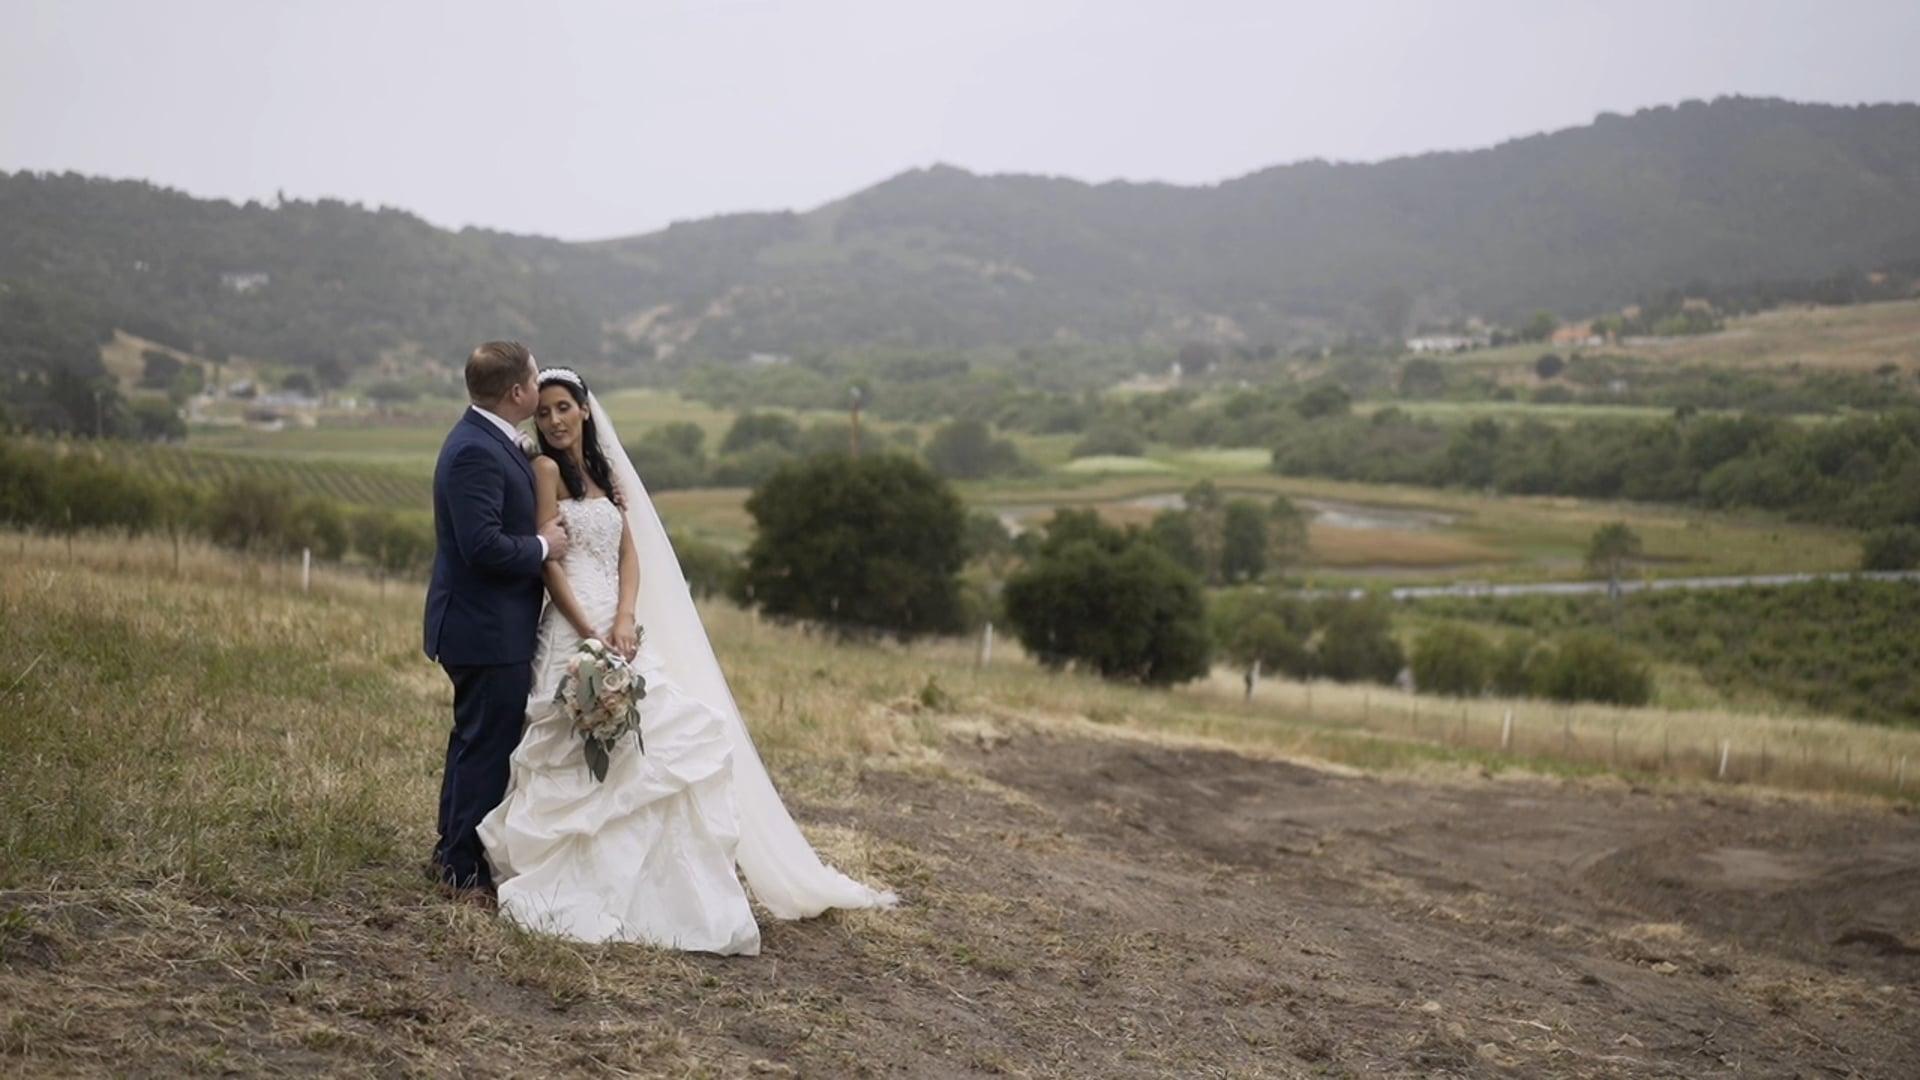 The Olivers' Fairytale Wedding